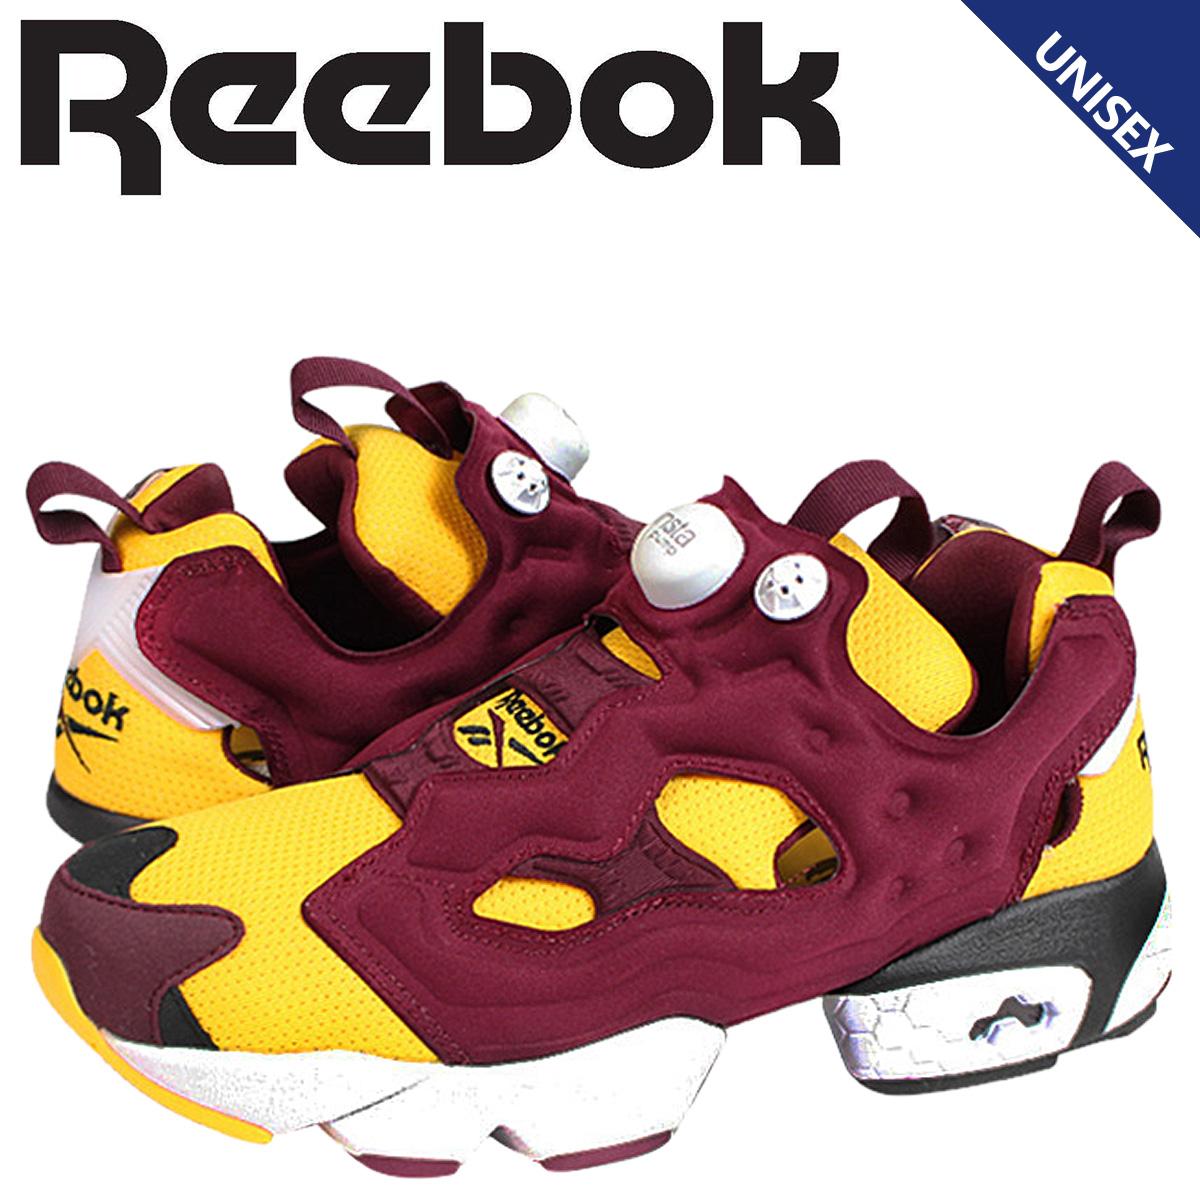 Reebok リーボック ポンプフューリー アイアンマン スニーカー INSTAPUMP FURY OG IRONMAN V62247 メンズ レディース 靴 イエロー レッド